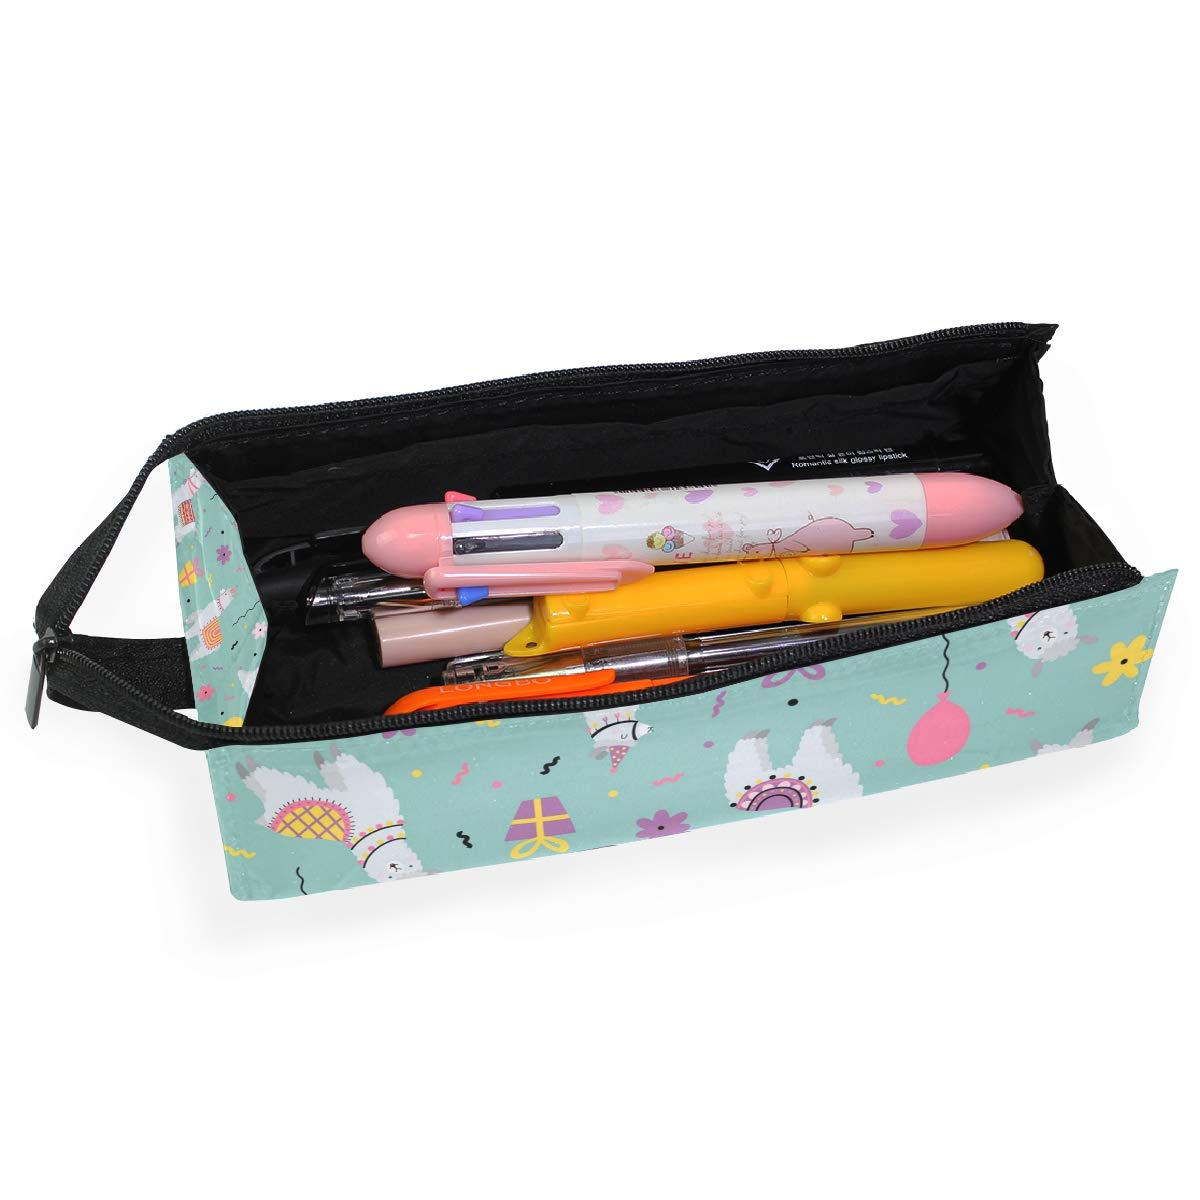 My Little Nest Eyeglass Sunglasses Holder Pouch Bag Cactus Multi Function Zipper Pen Case Pencil Bag Organizer